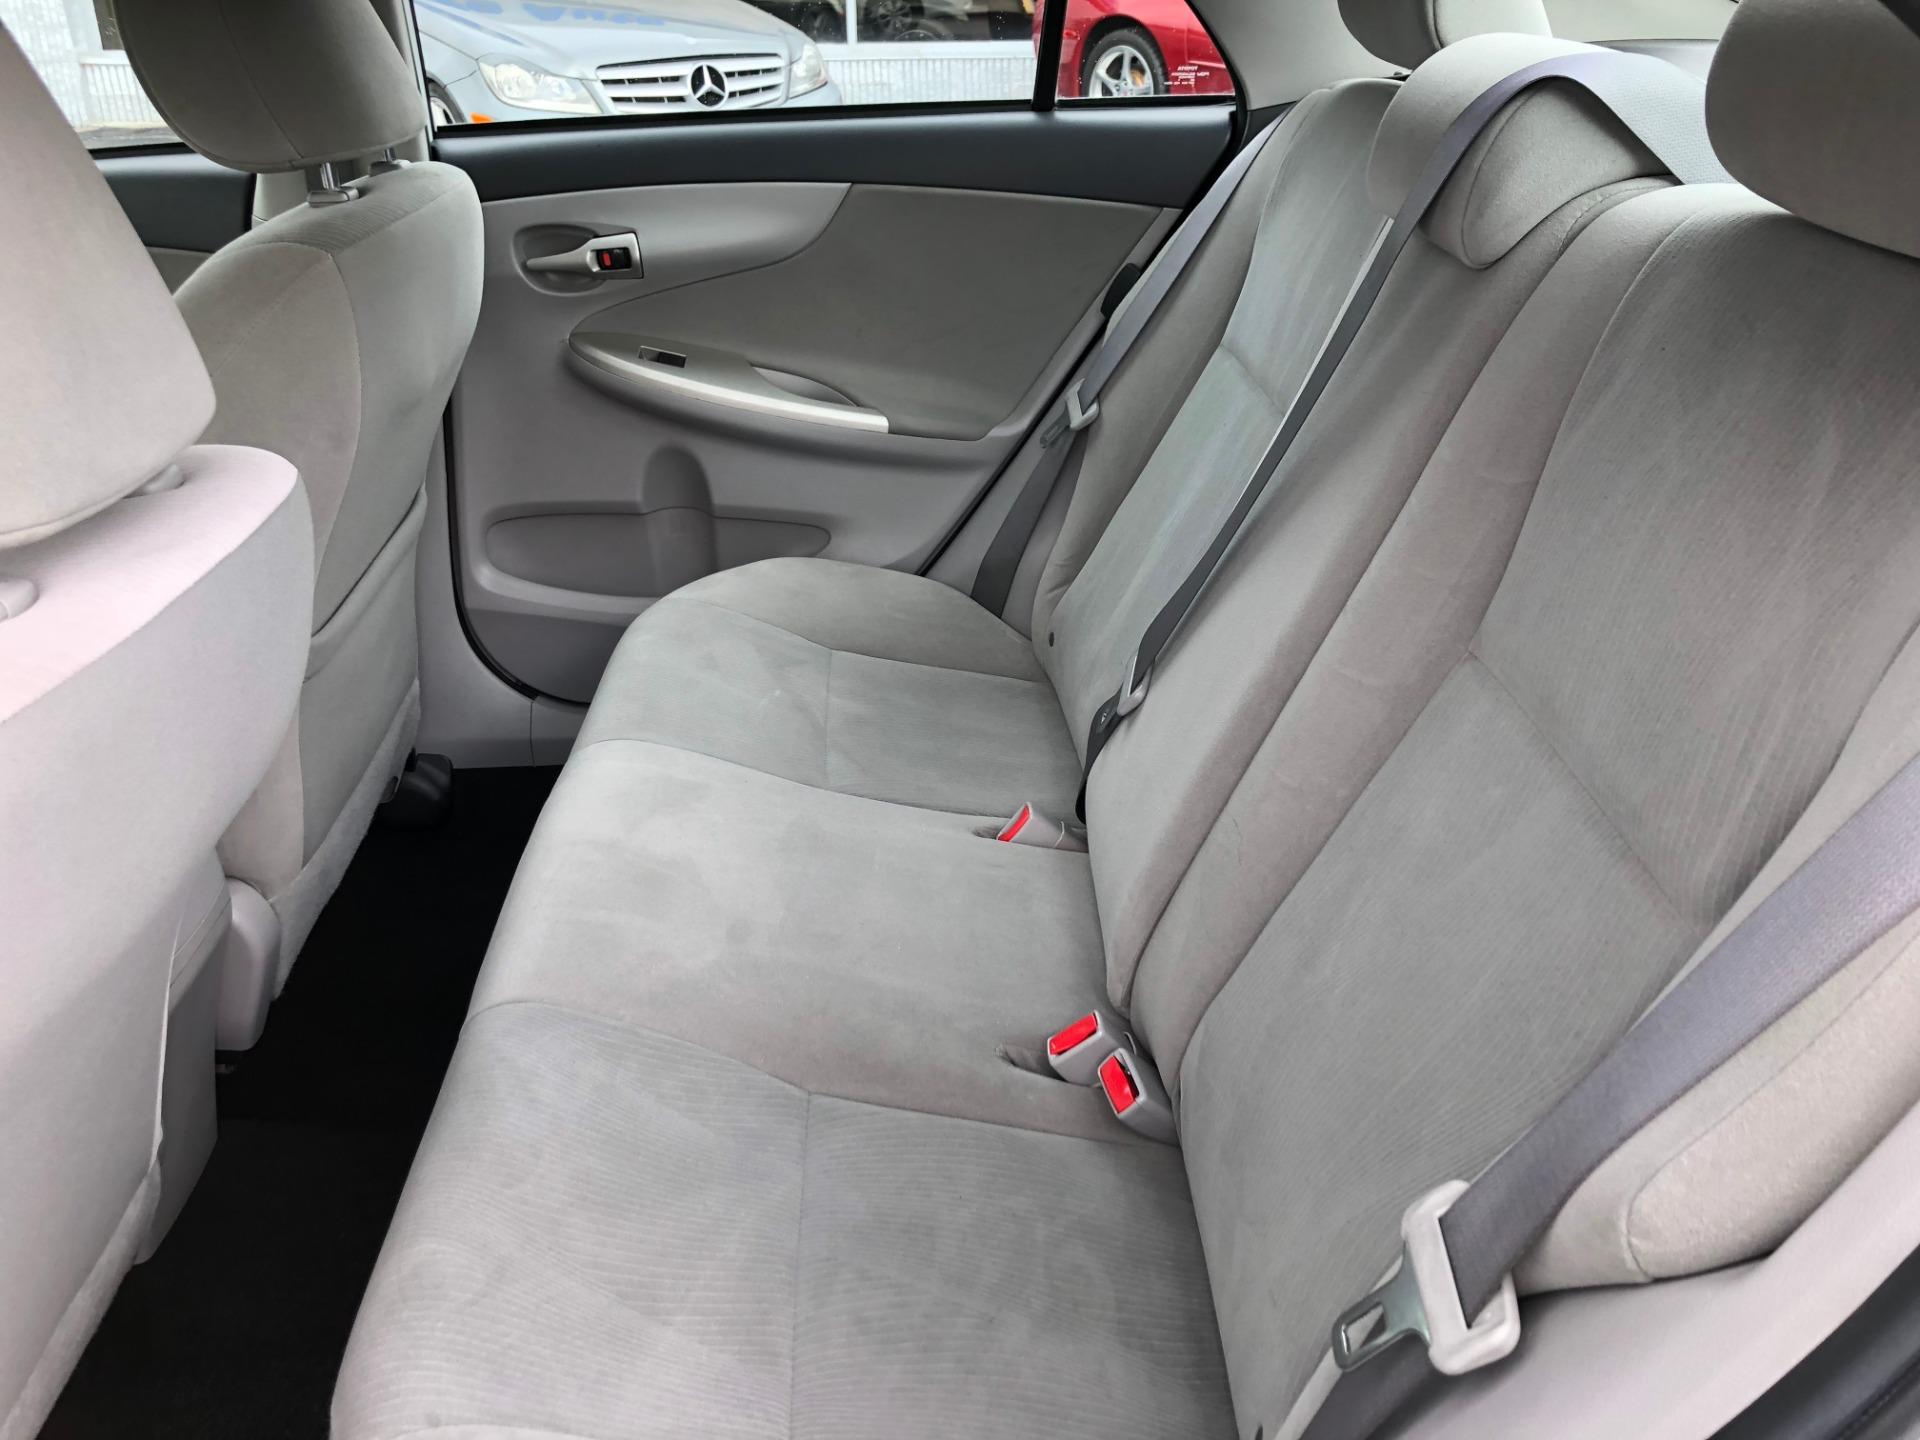 Toyota Corolla Repair Manual: Seat belt warning system